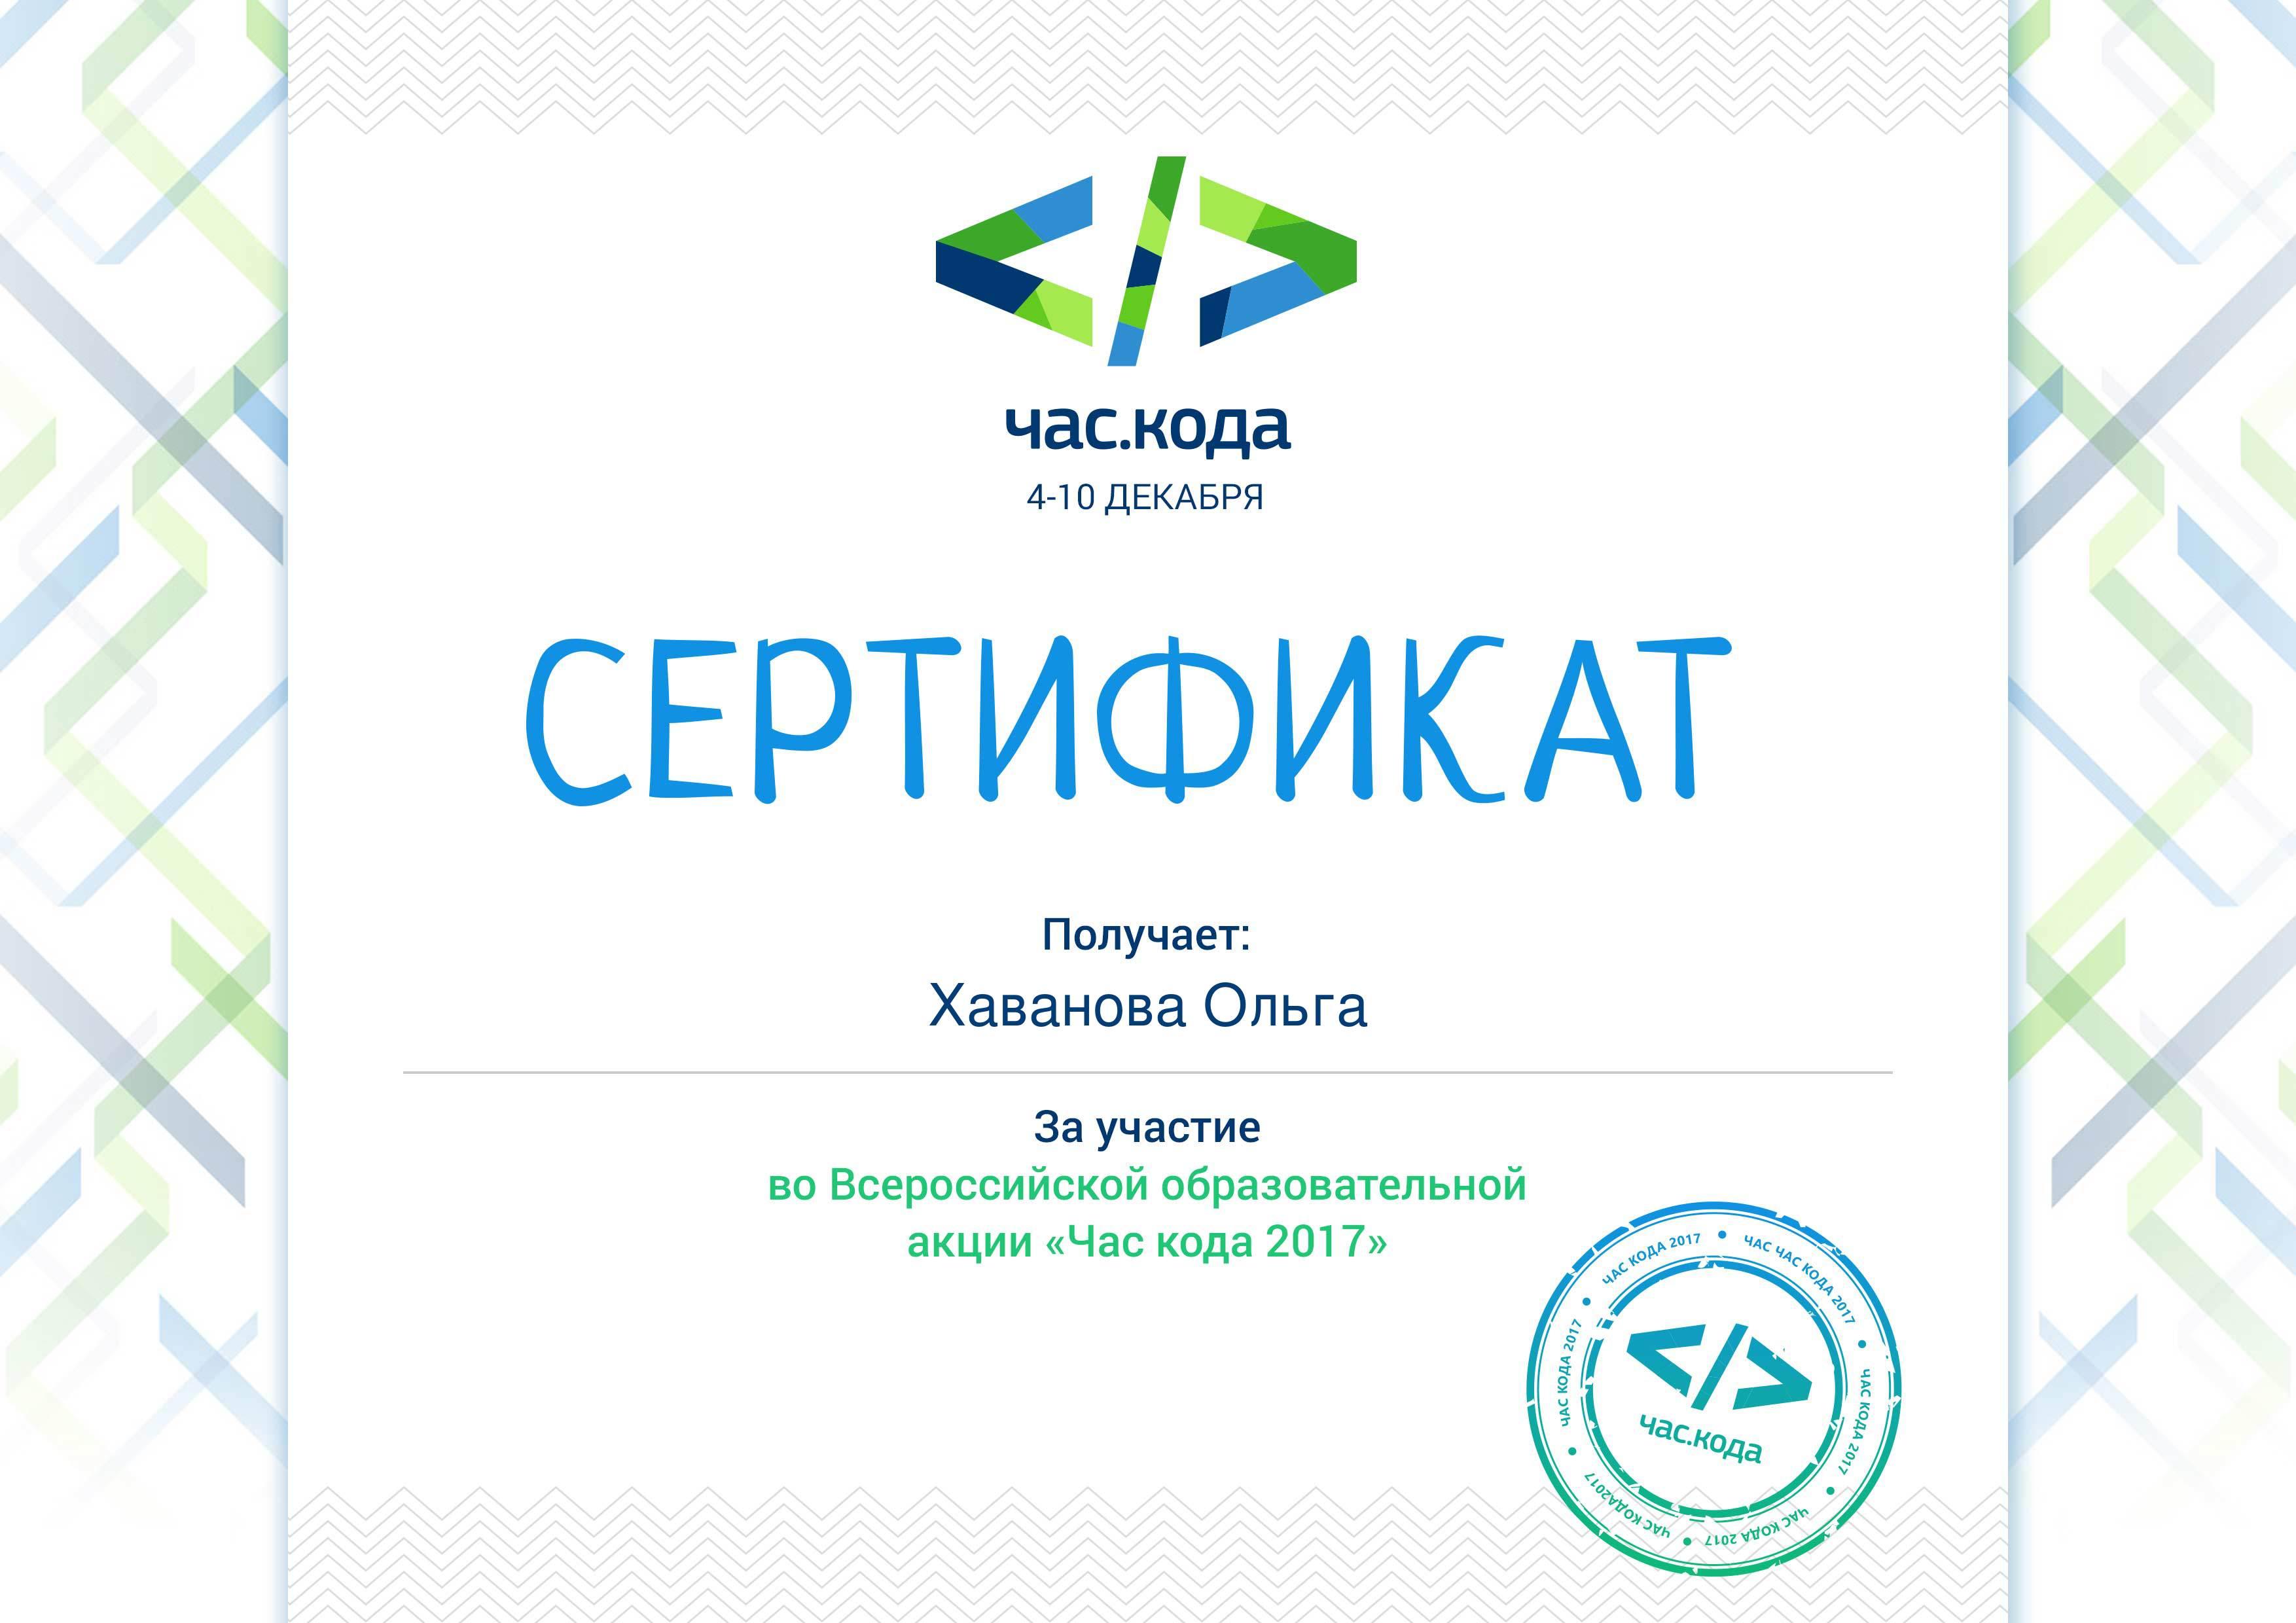 Khavanova_Ol